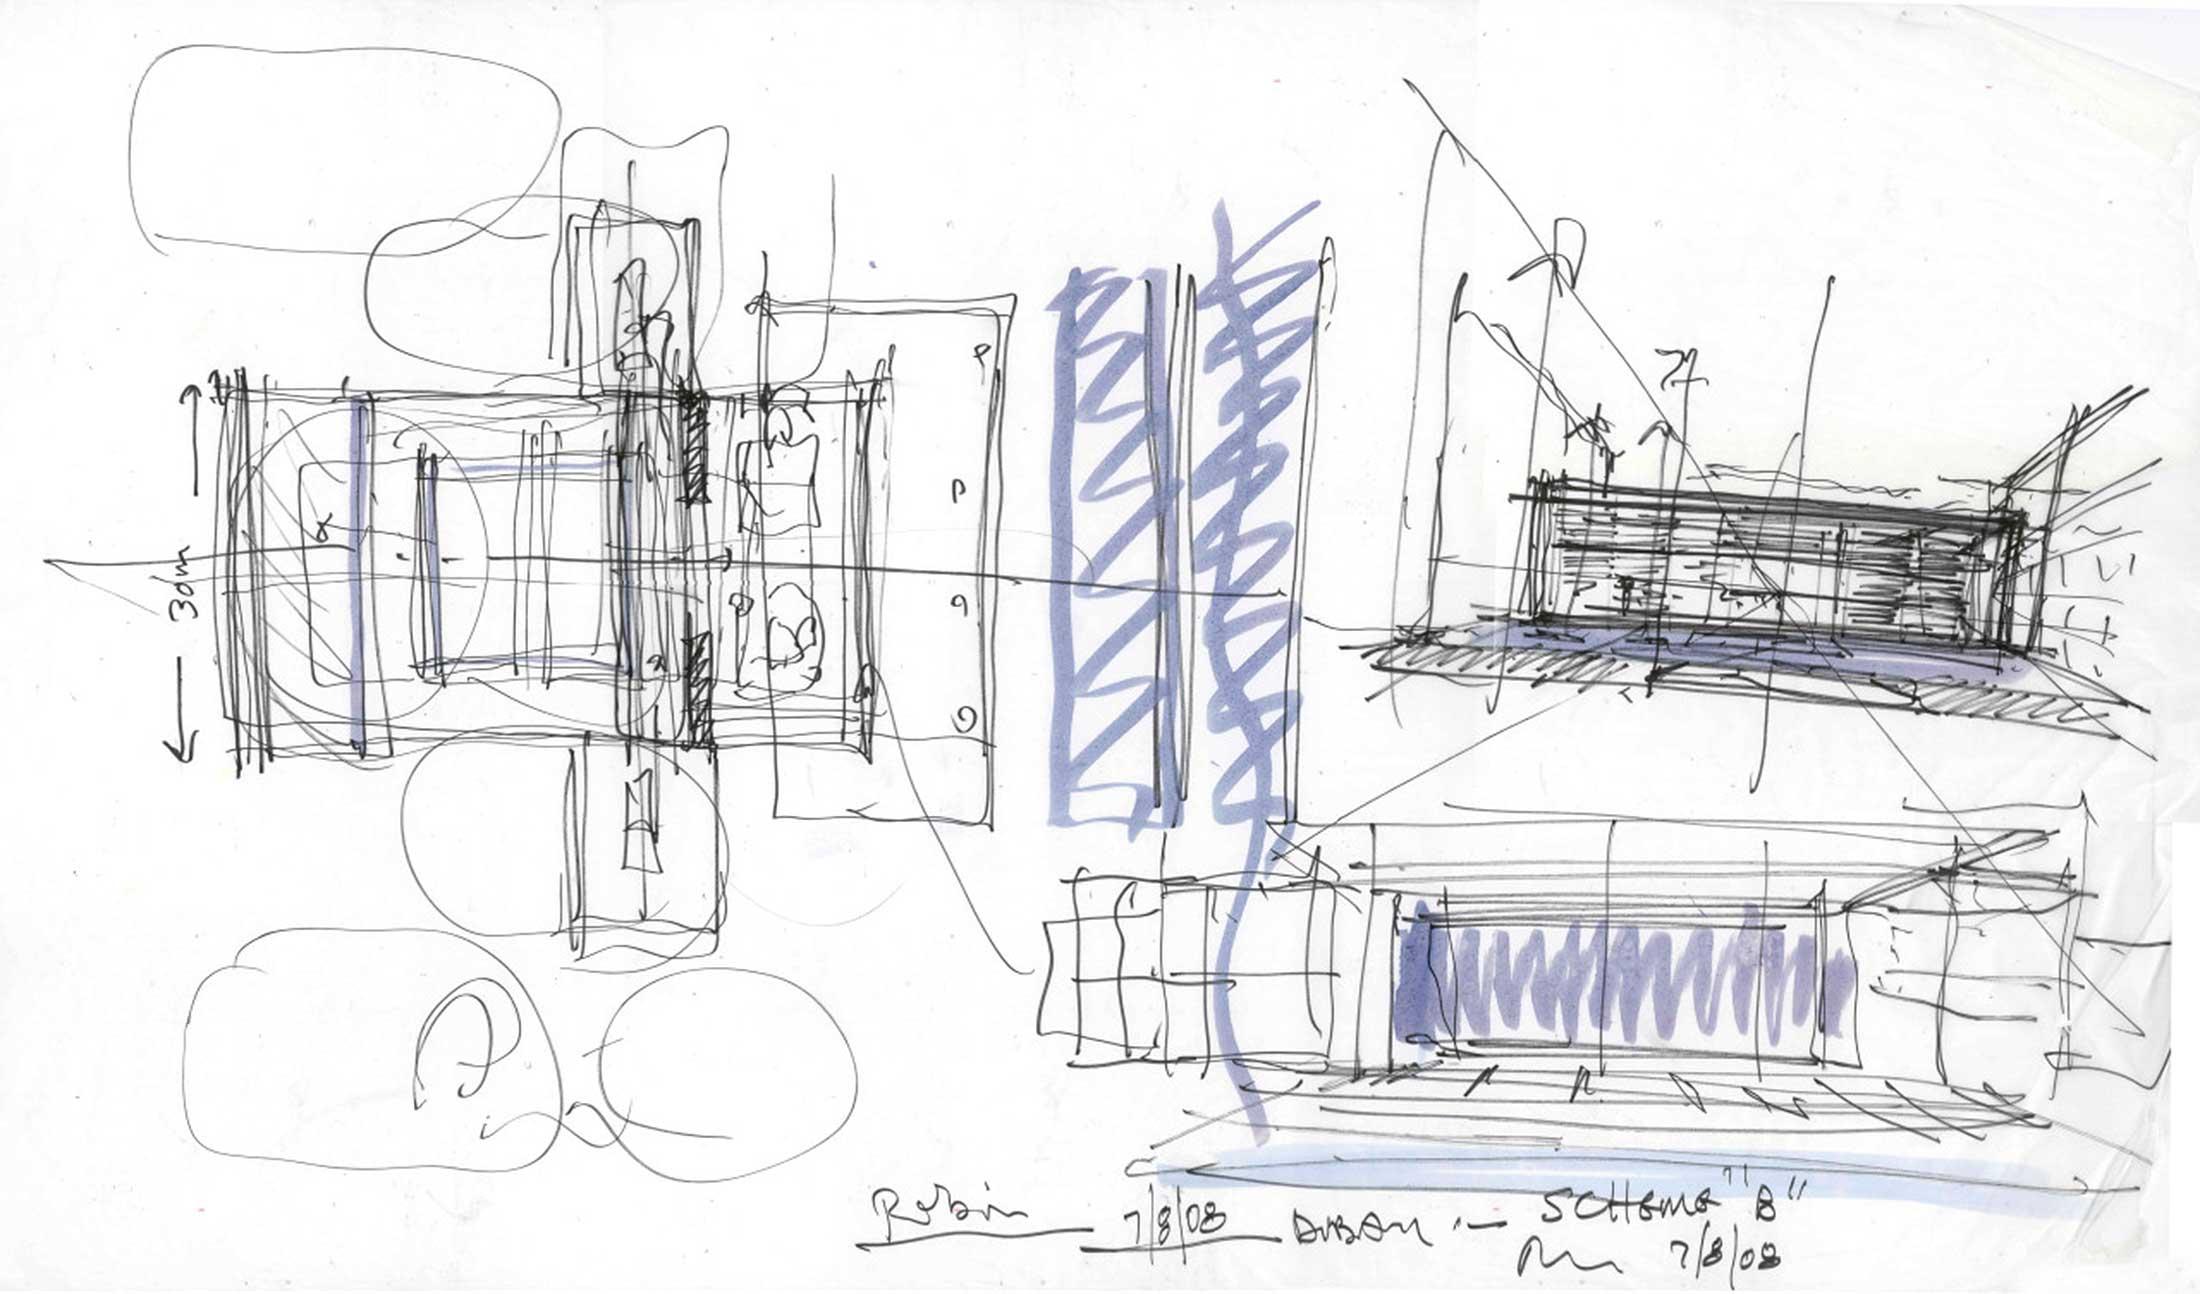 modern-architecture-residential-estate-uae-plan-sketch-shubindonaldson-dubai-villas-2